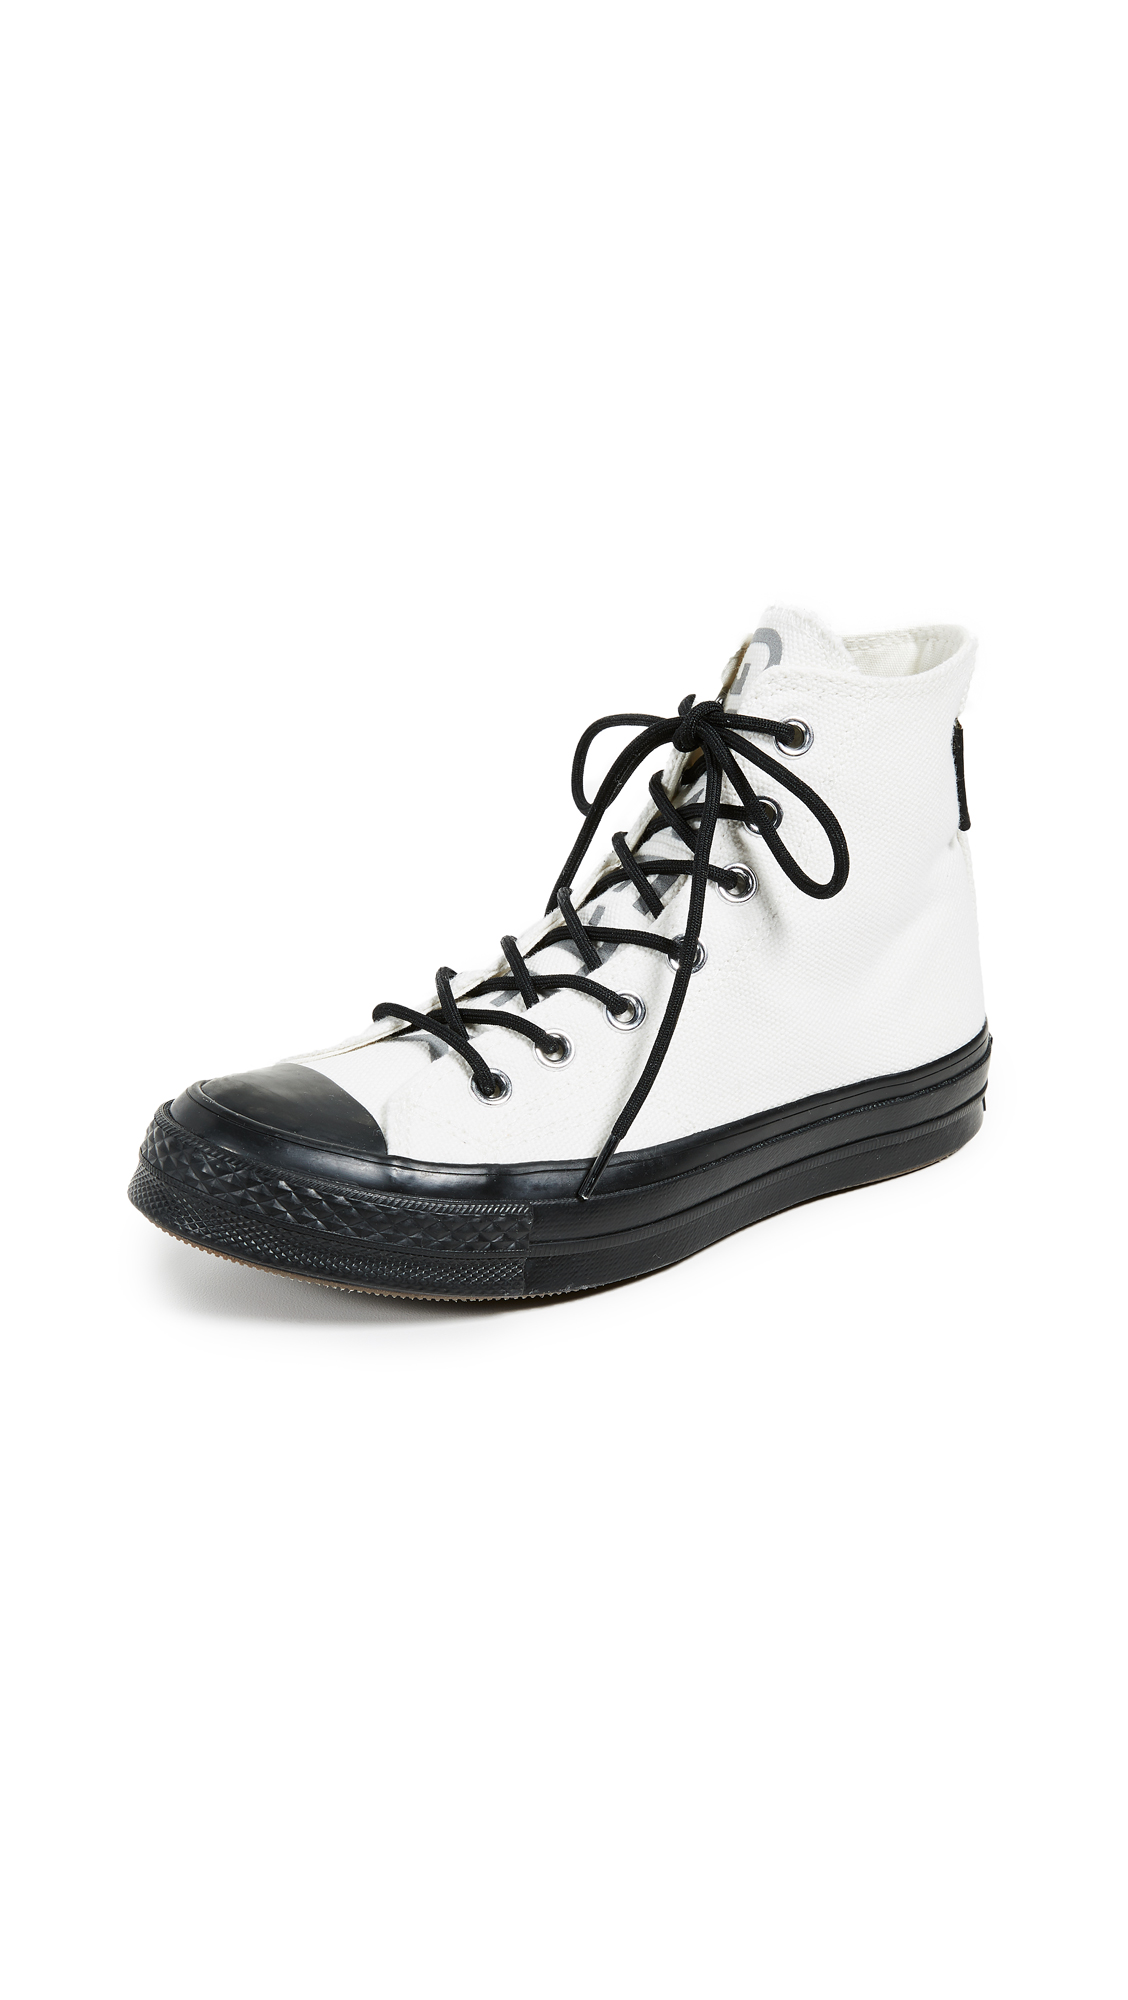 Converse Chuck 70 Gore Tex High Top Sneakers - White/Black/Brown